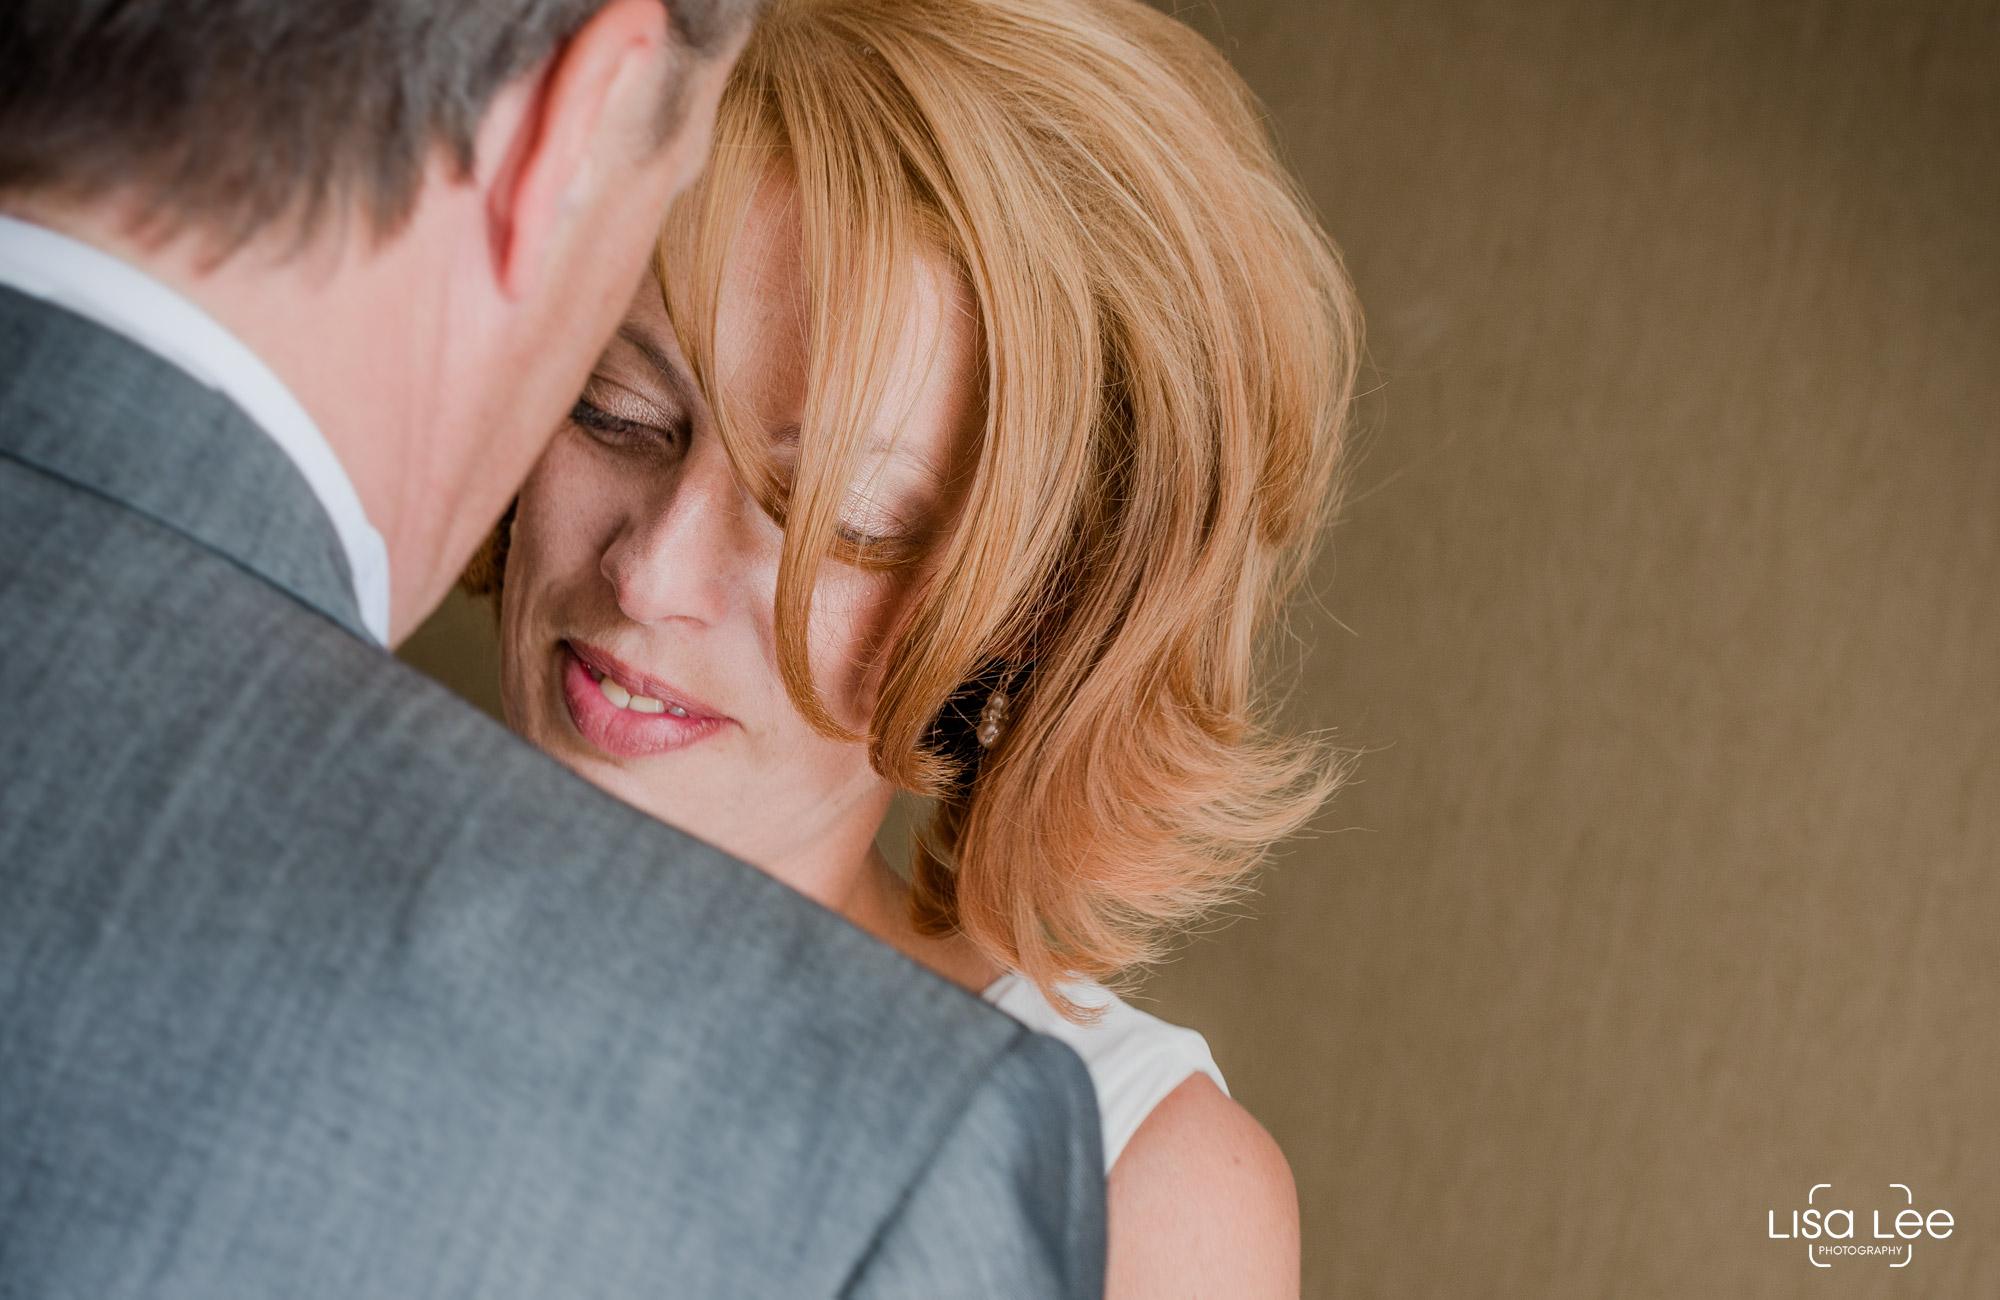 lisa-lee-wedding-photography-christchurch-dorset-bride3.jpg